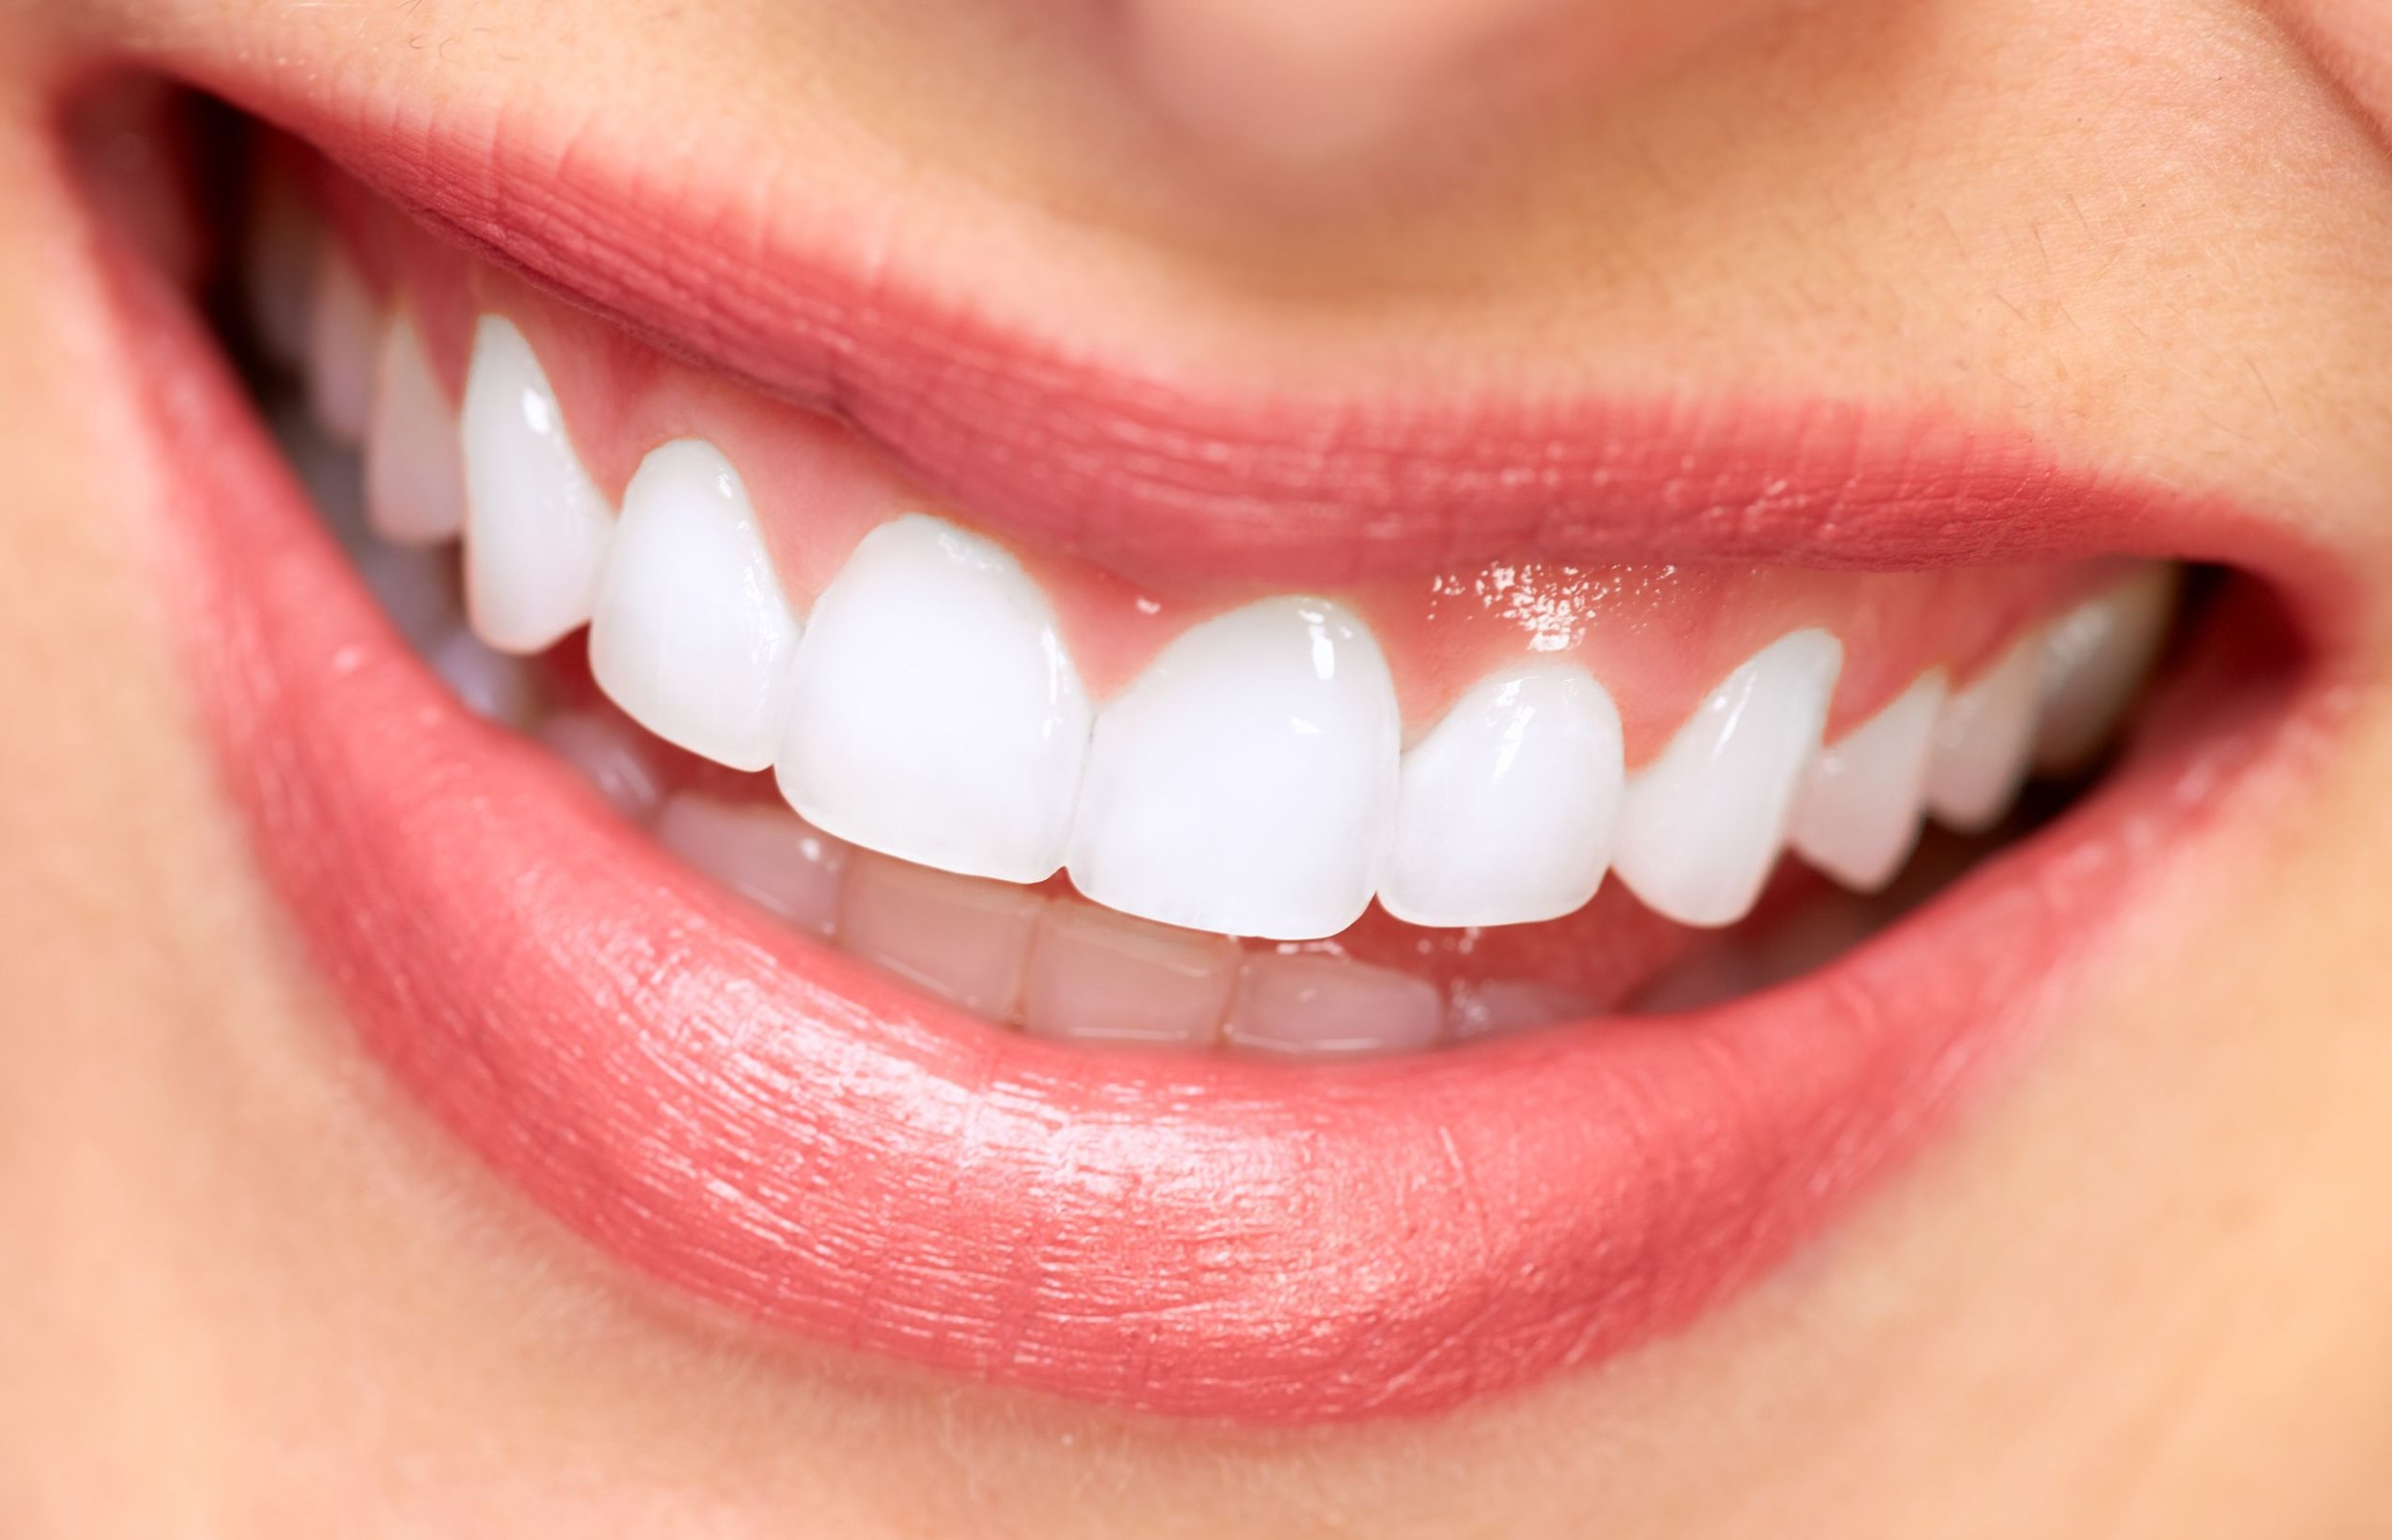 Gum Contouring at Eastlake Center for Implants and Restorative Dentistry